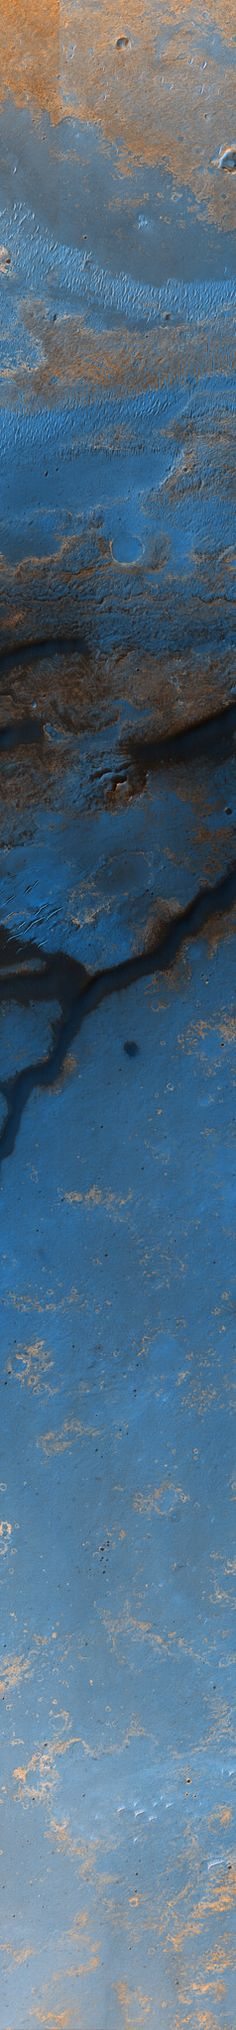 Dune Field in East Endeavour Crater, variant | Stuart Rankin, Edited Mars Reconnaissance Orbiter